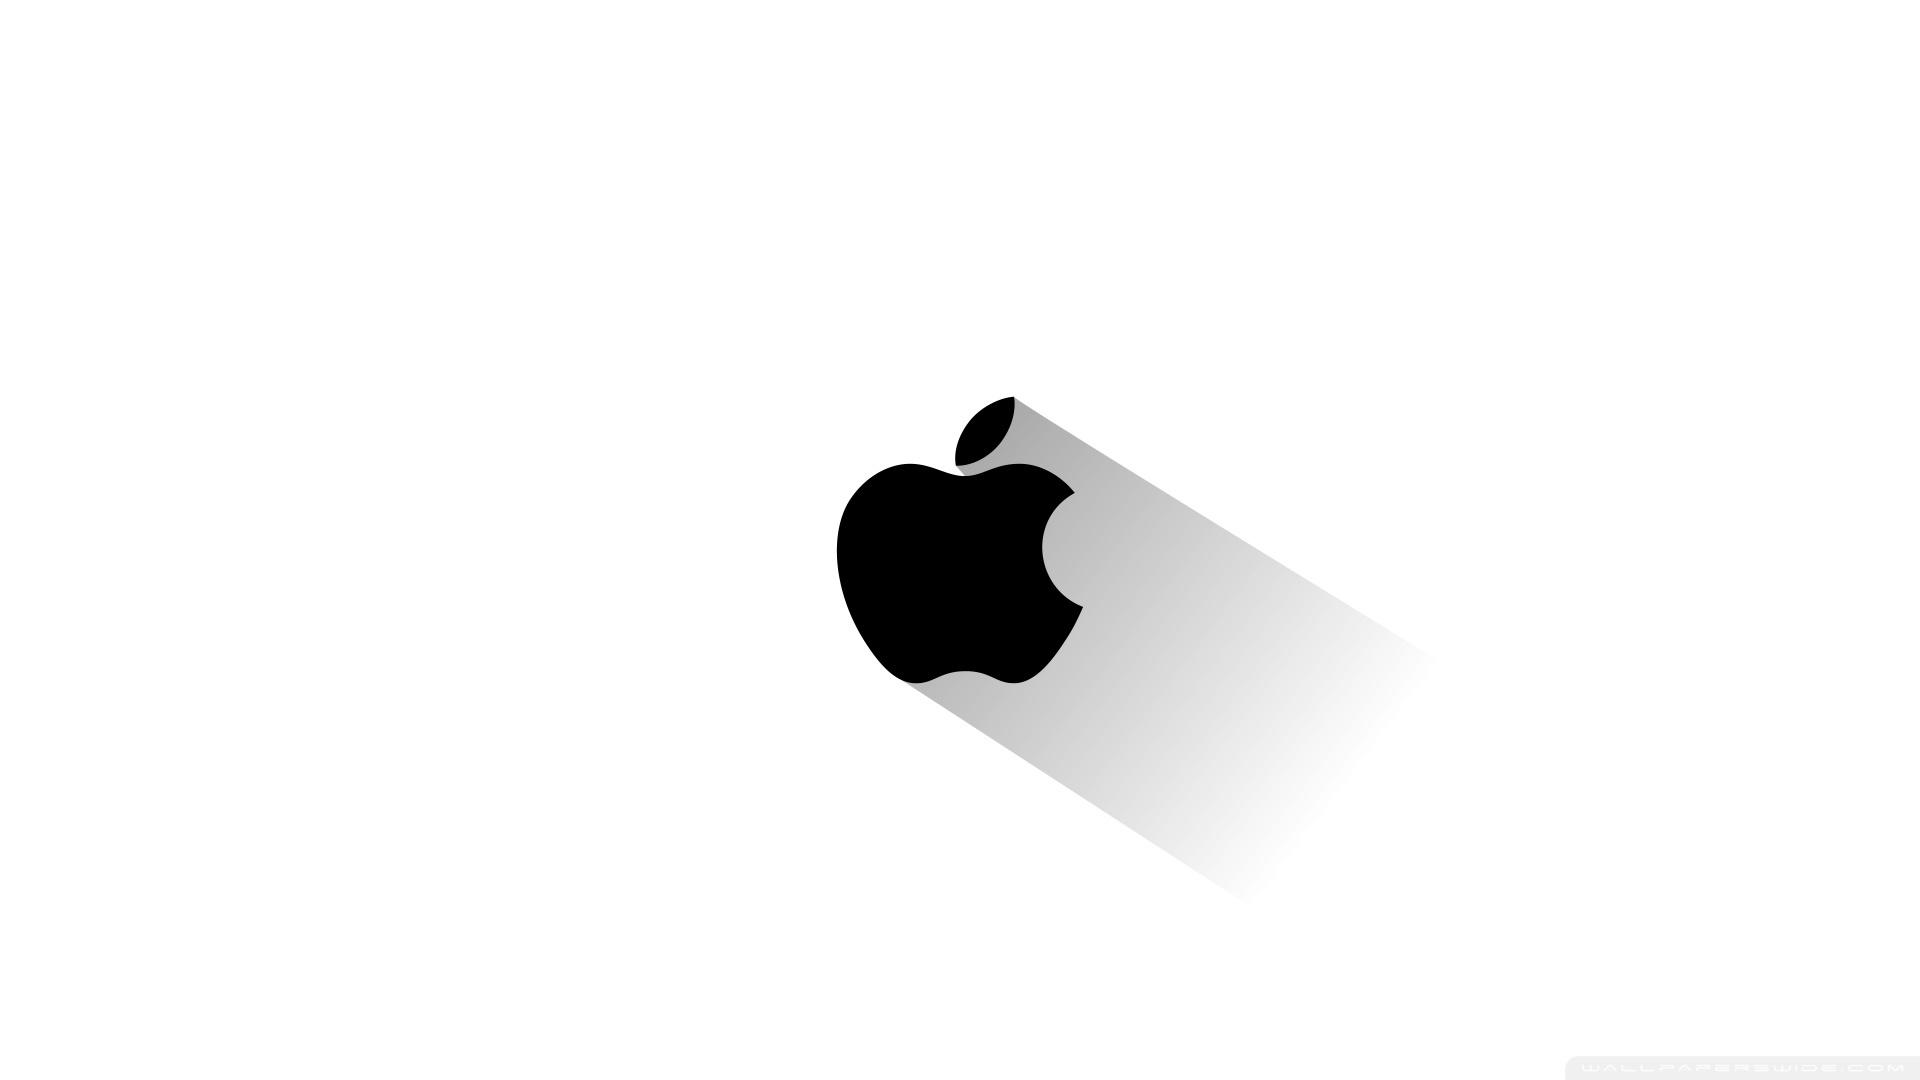 Apple Logo 4K HD Desktop Wallpaper for • Wide  Ultra Widescreen Displays • Dual Monitor